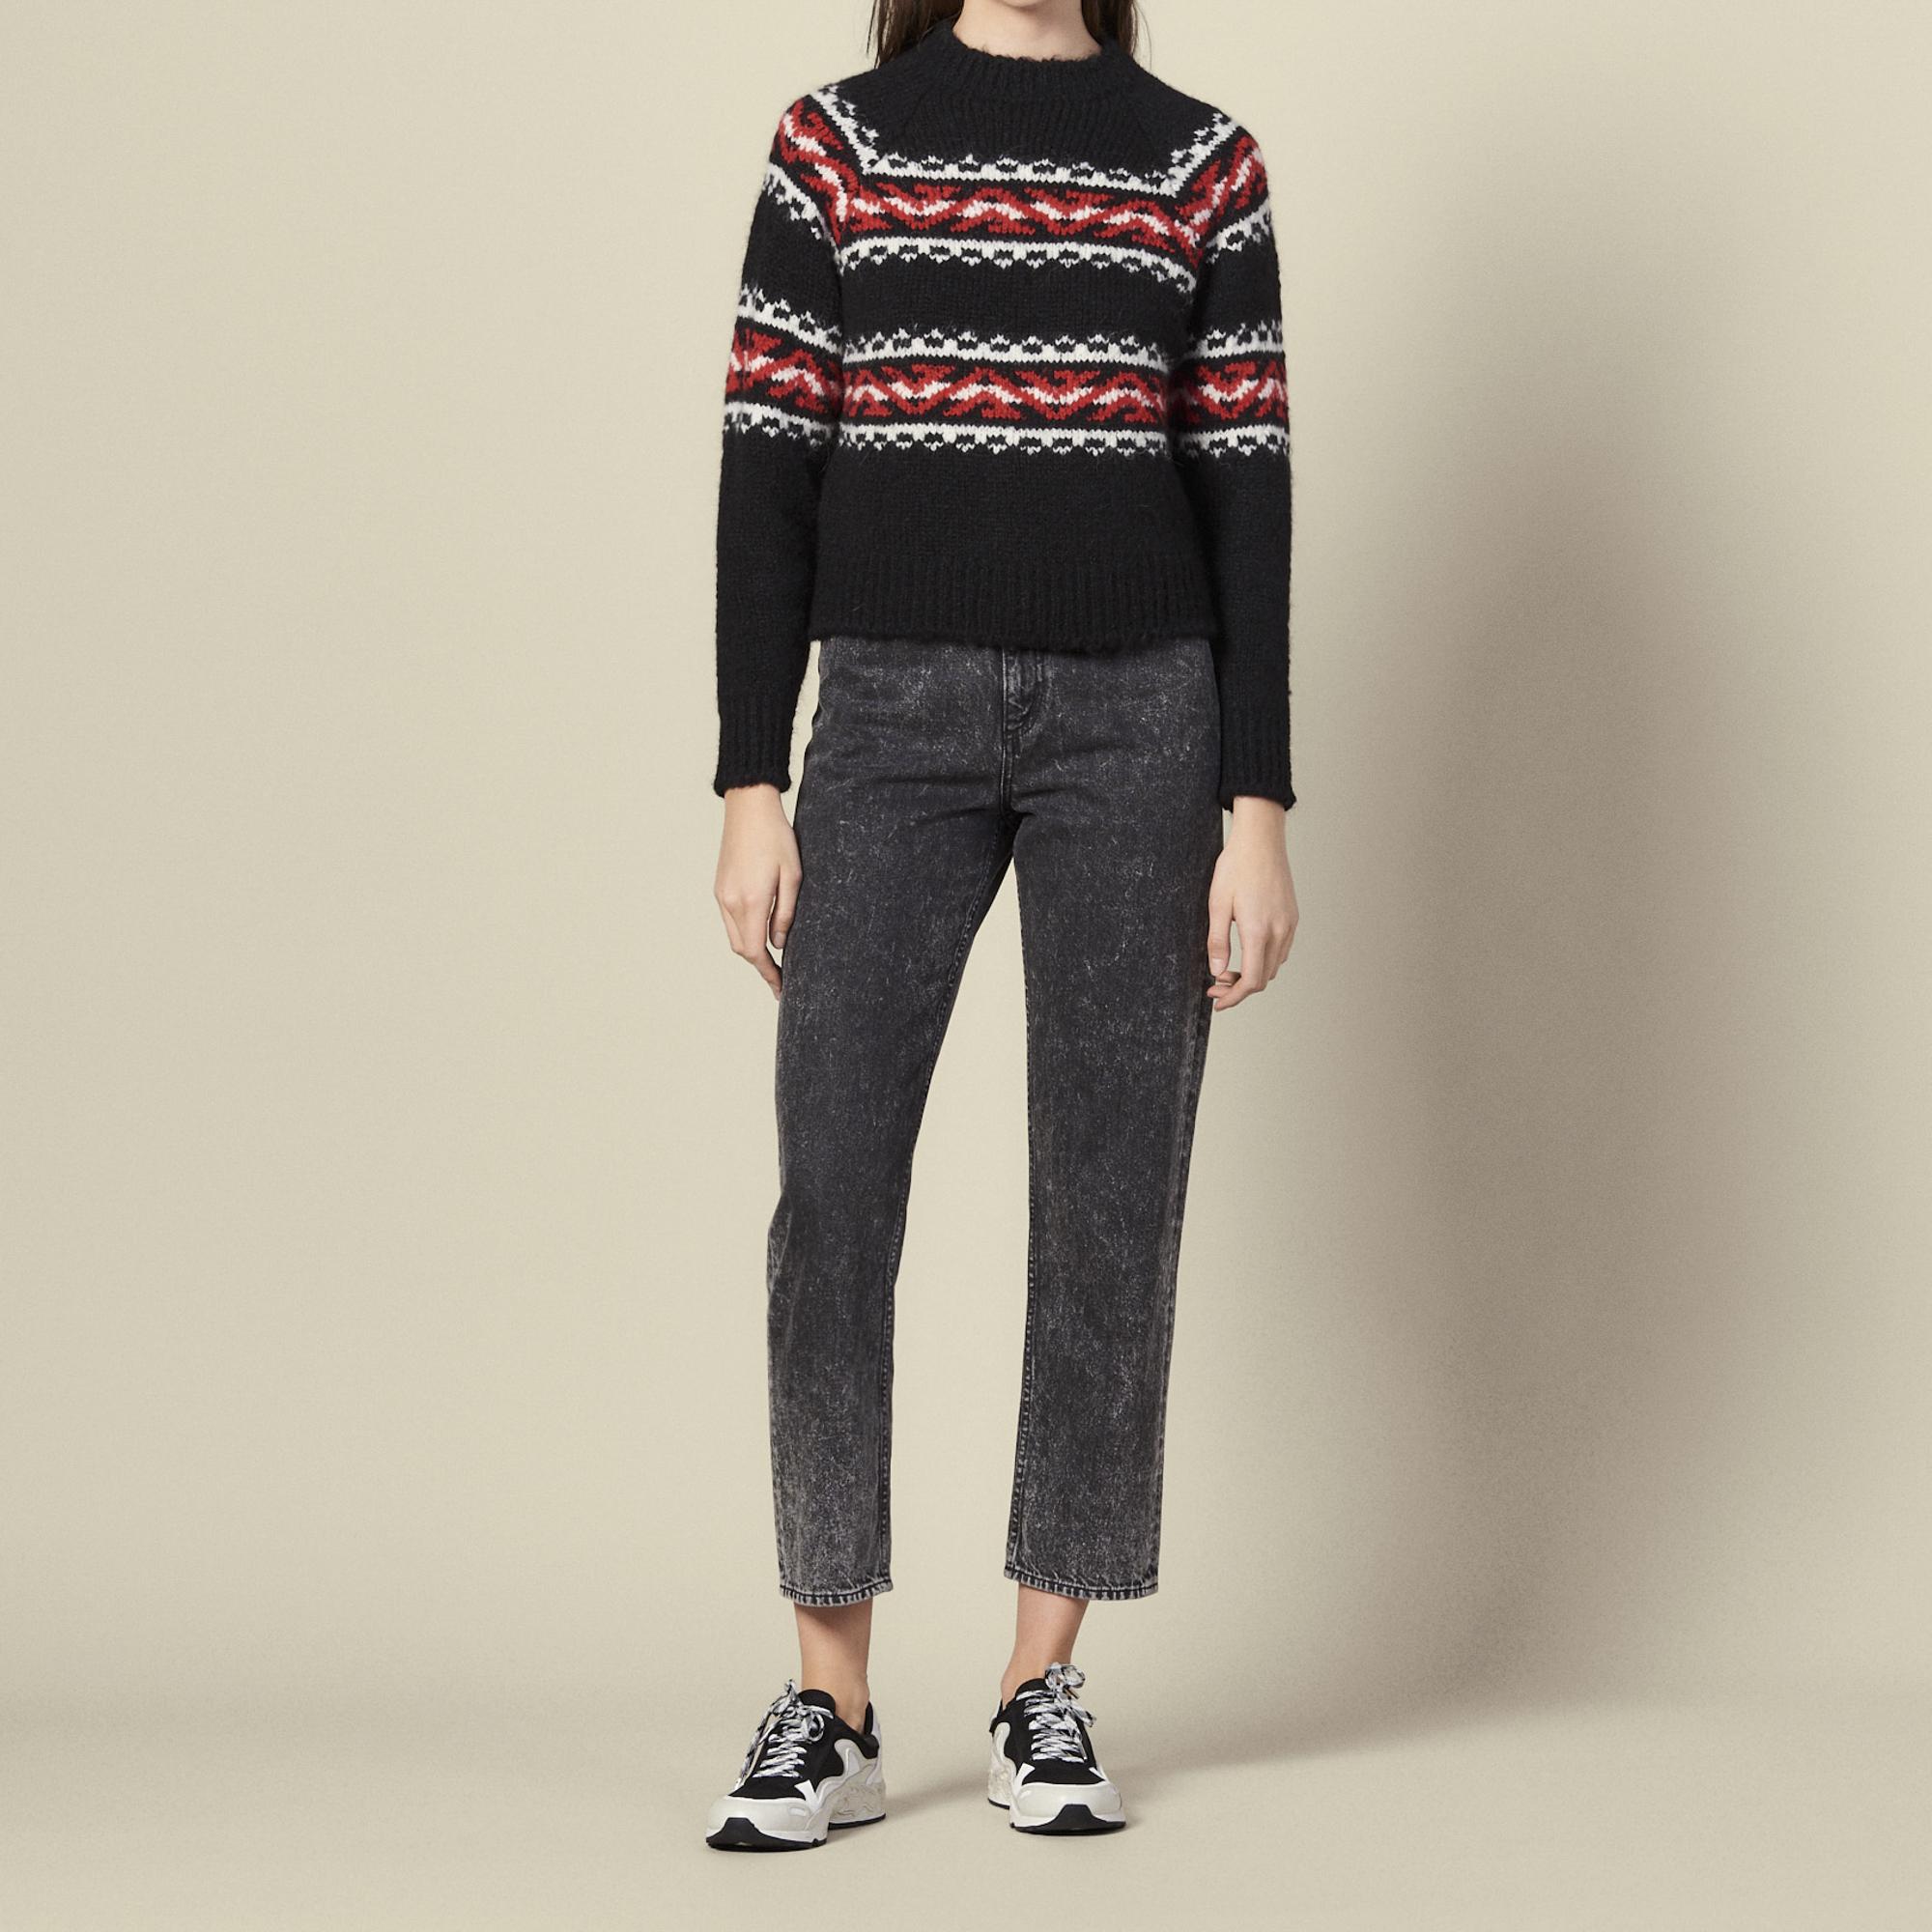 Sweater with geometric jacquard pattern